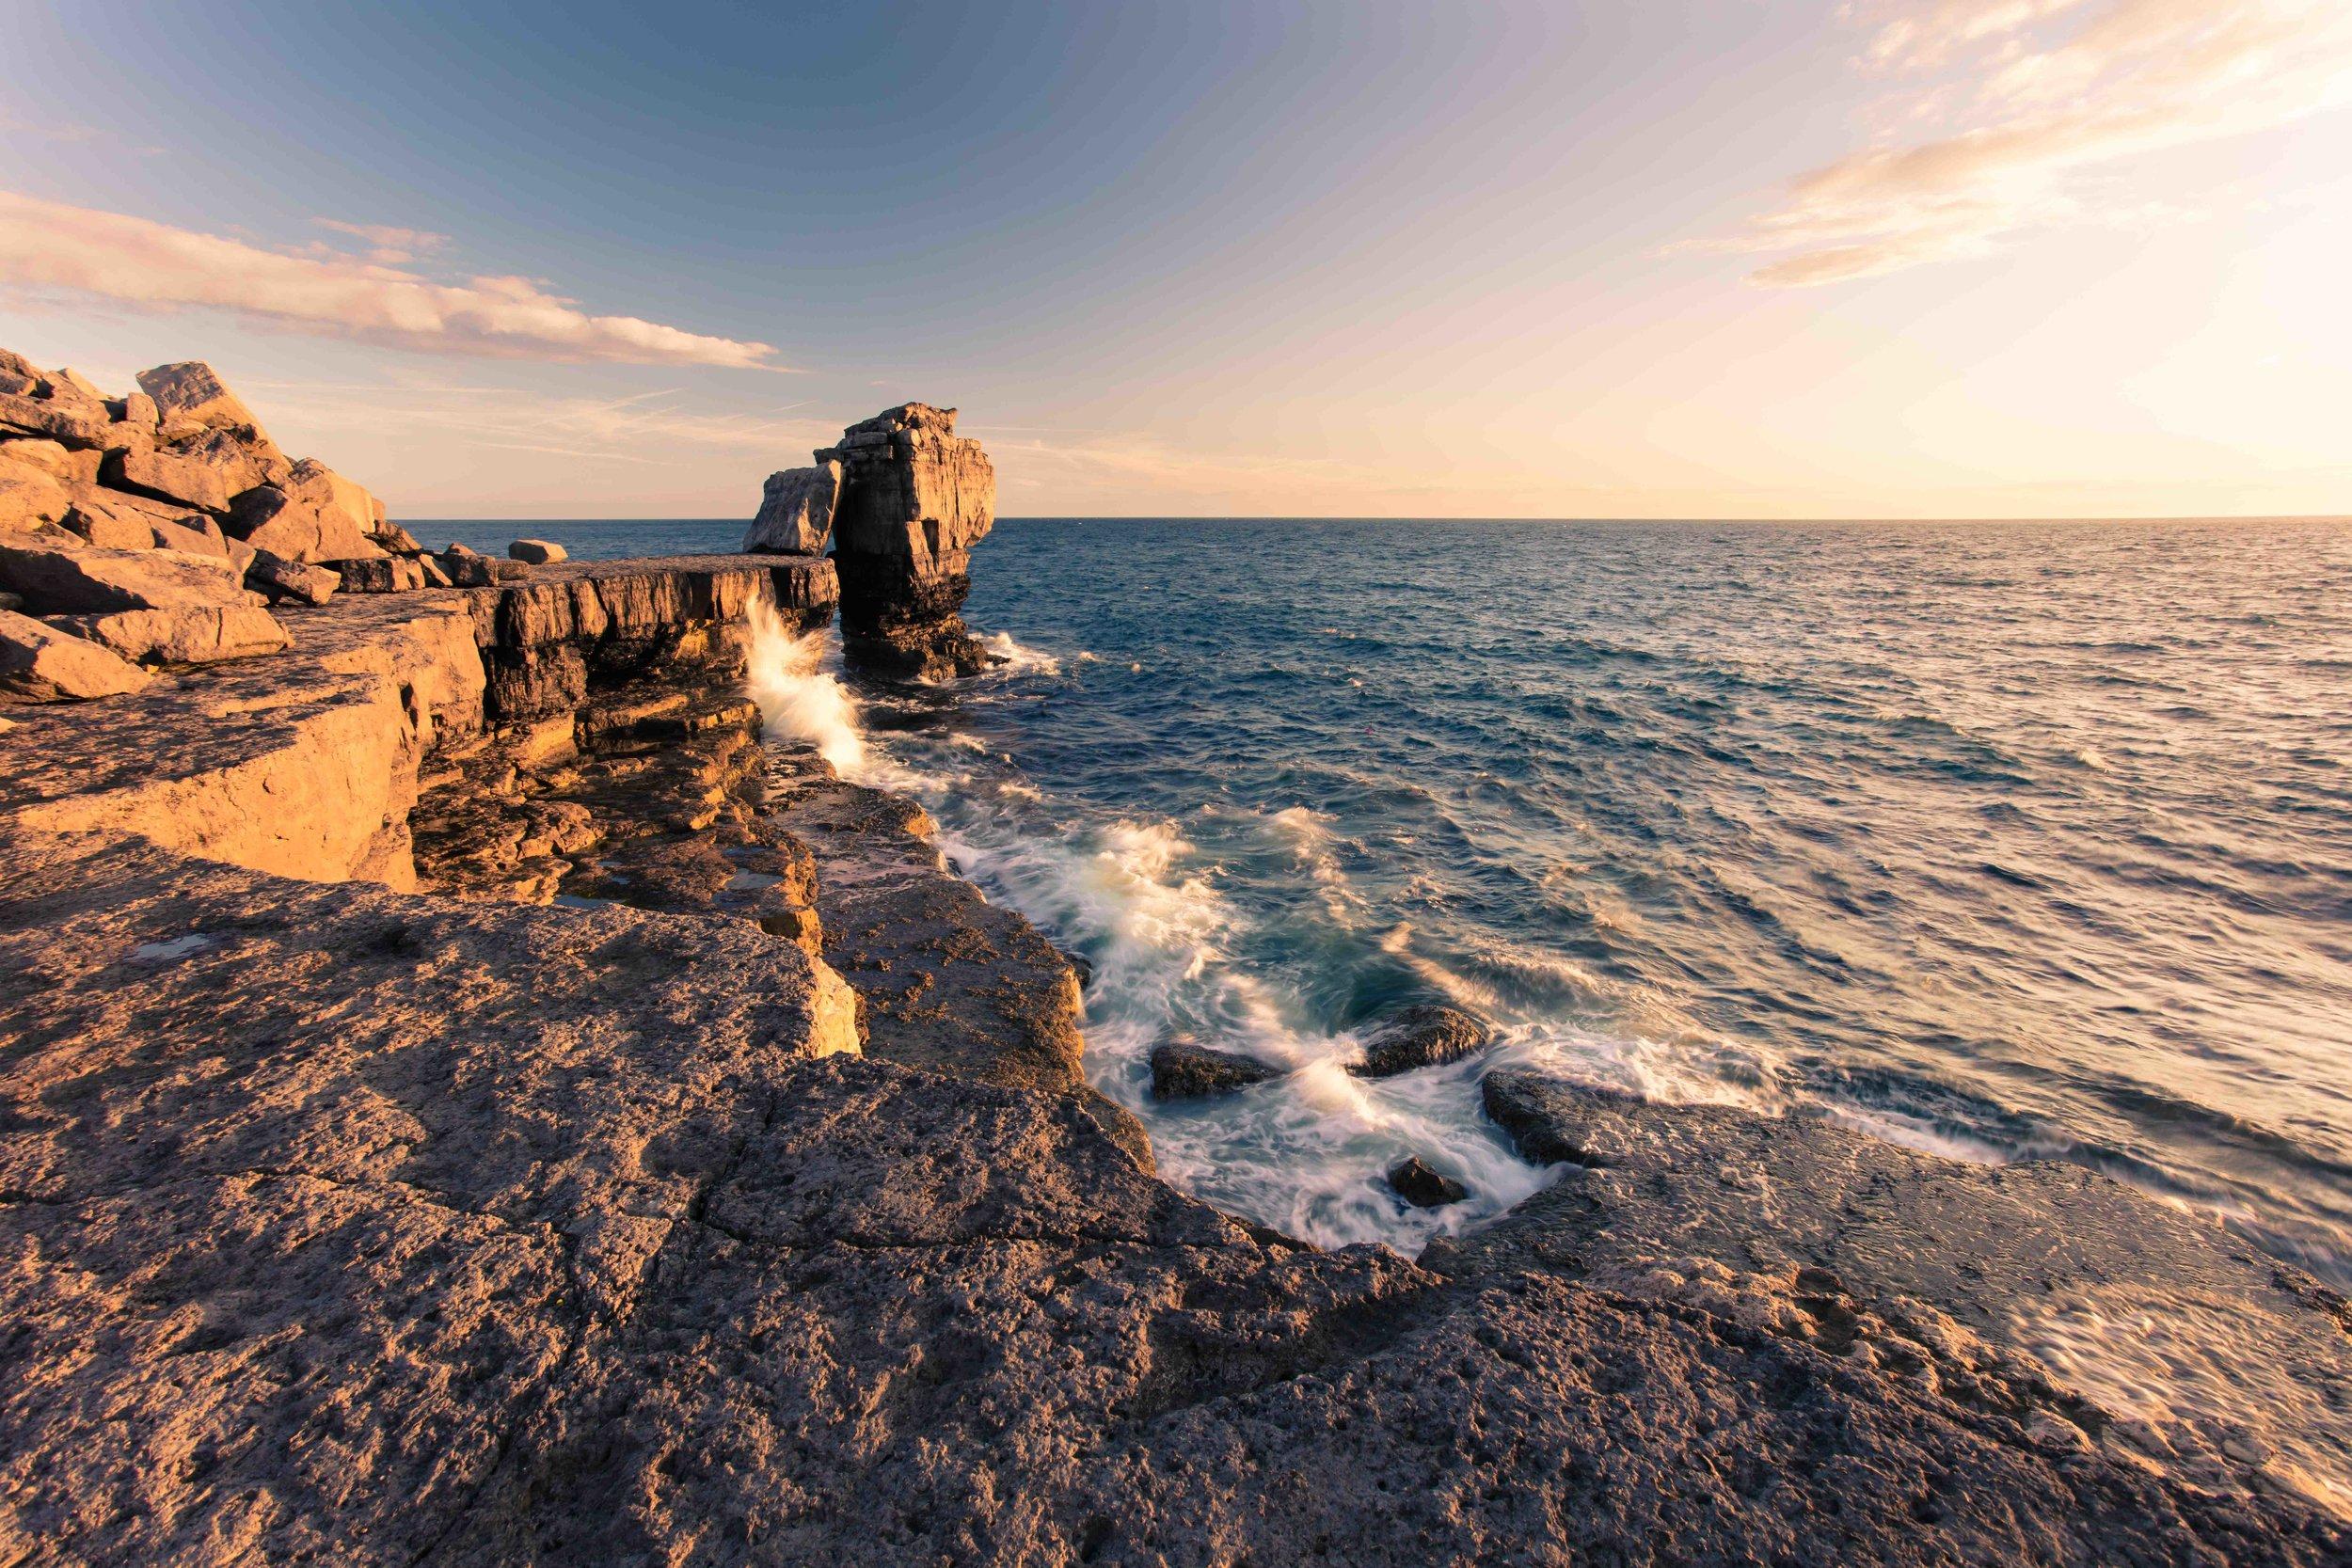 Pulpit Rock, Dorset, UK